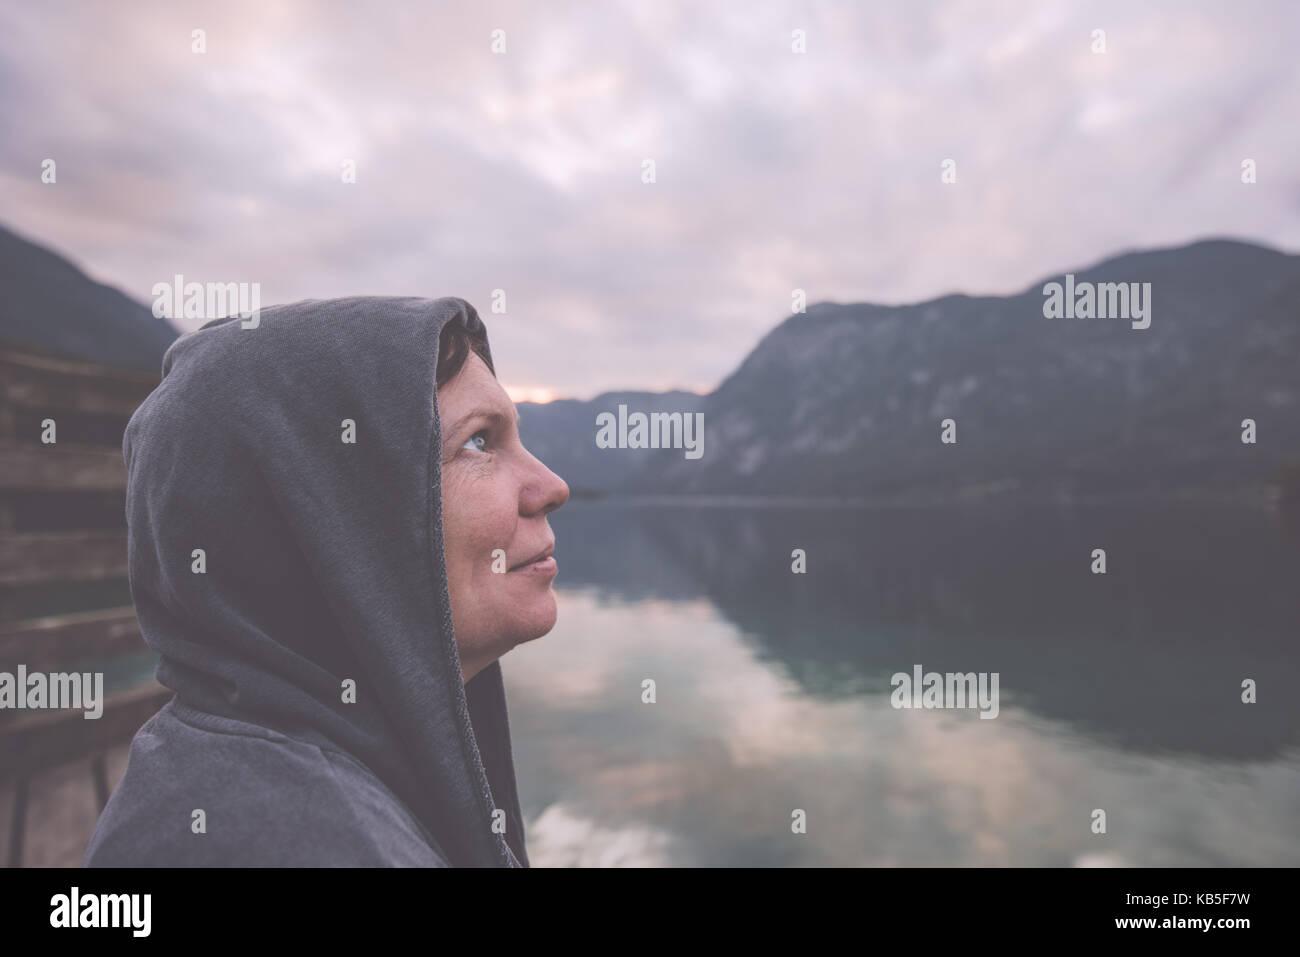 Nostalgic portrait of lonely melancholic adult female with hopeful look towards the sky standing on the lake shore - Stock Image